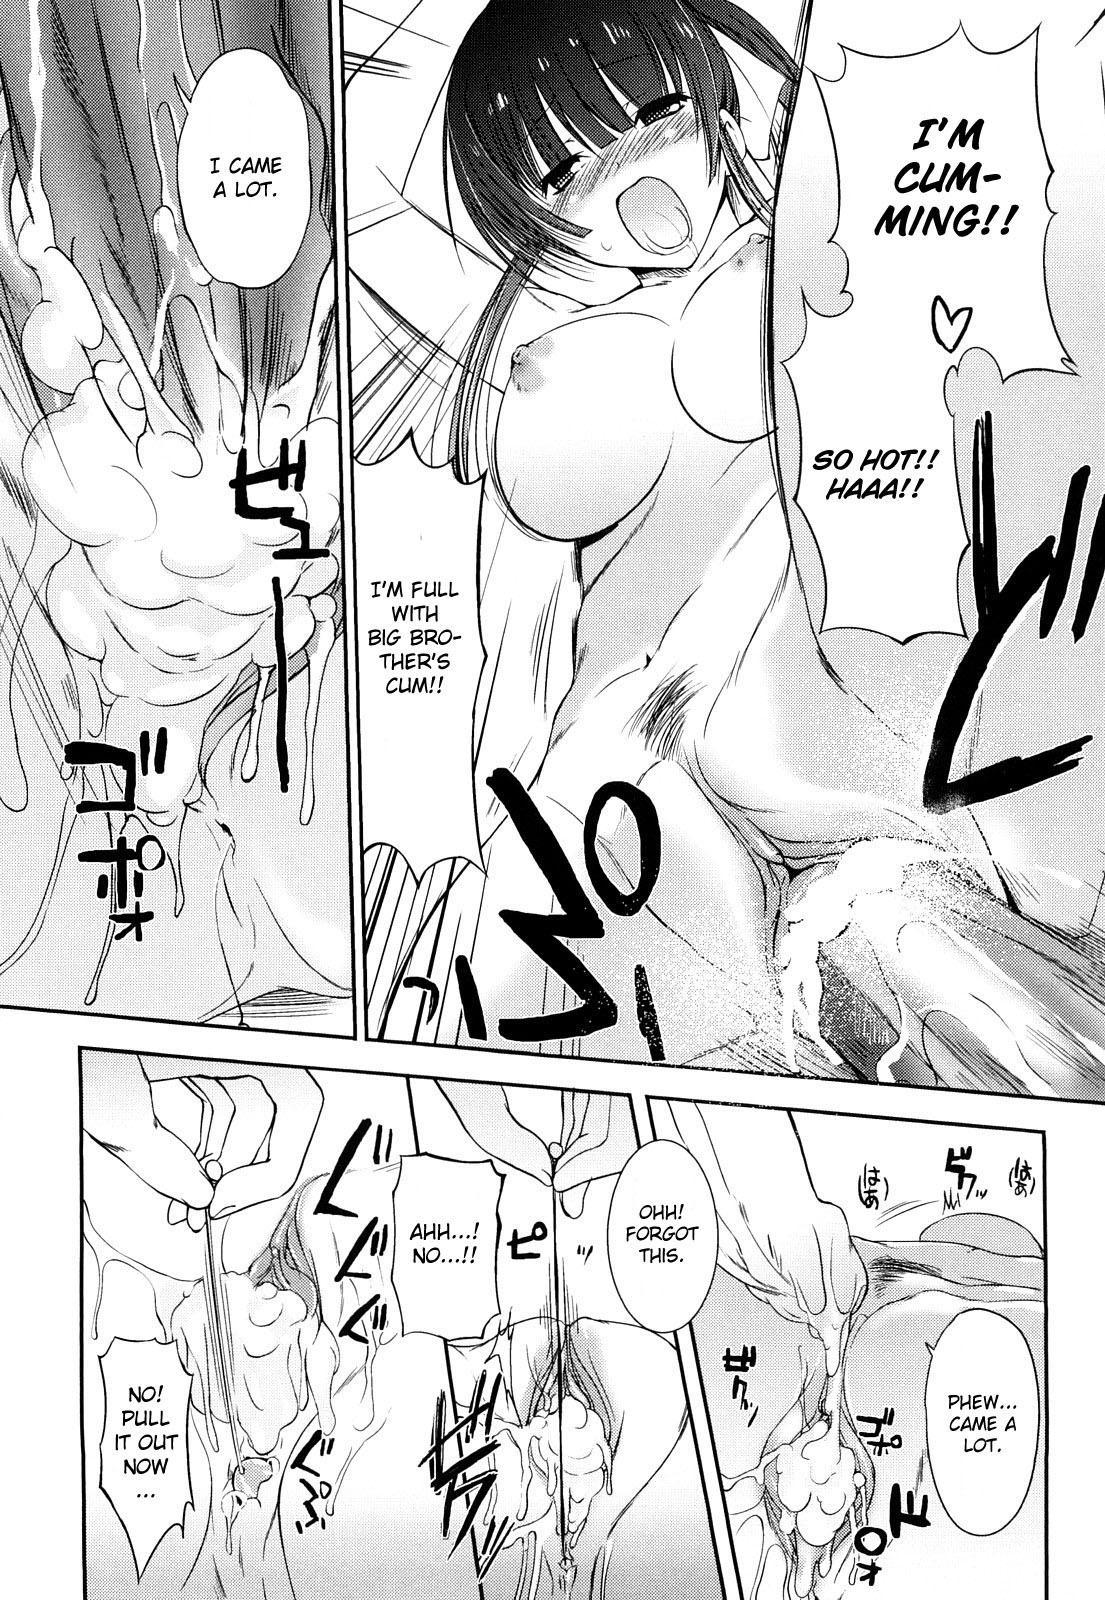 [Hanpera] Onee-san Whisper - Erotic Wisper [English] [CGRascal] [Decensored] 145